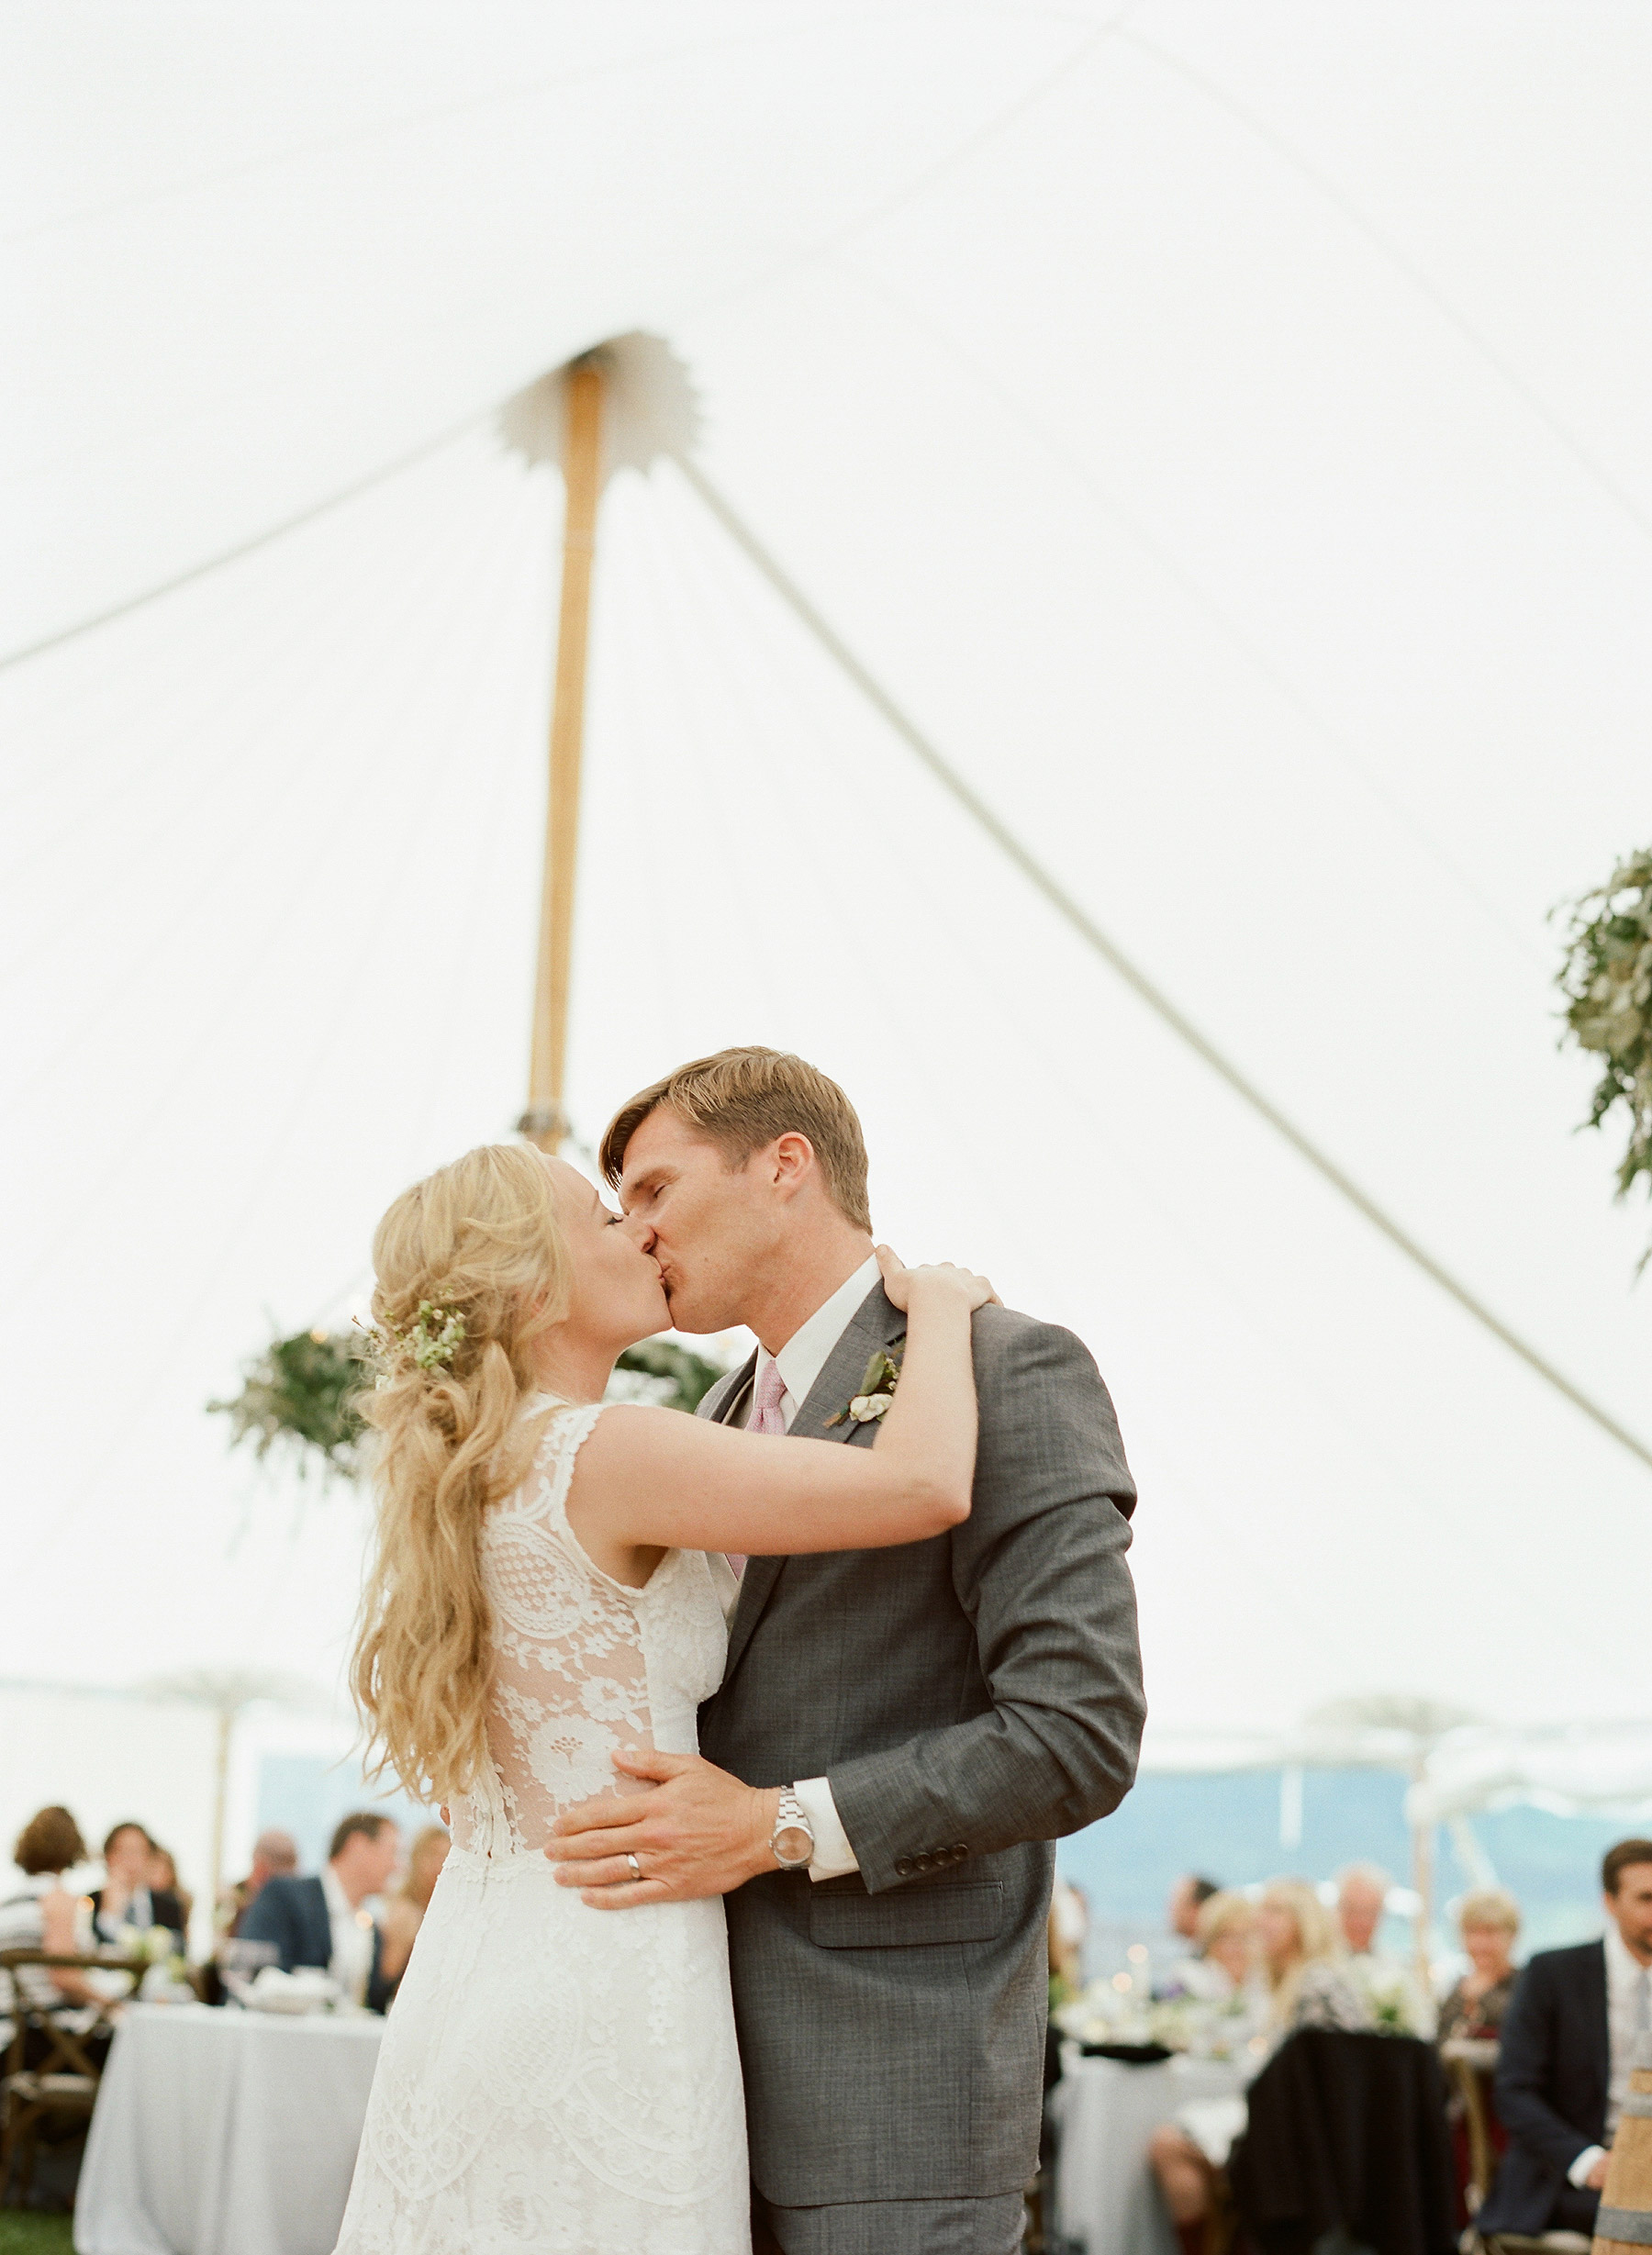 Colby John wedding first dance